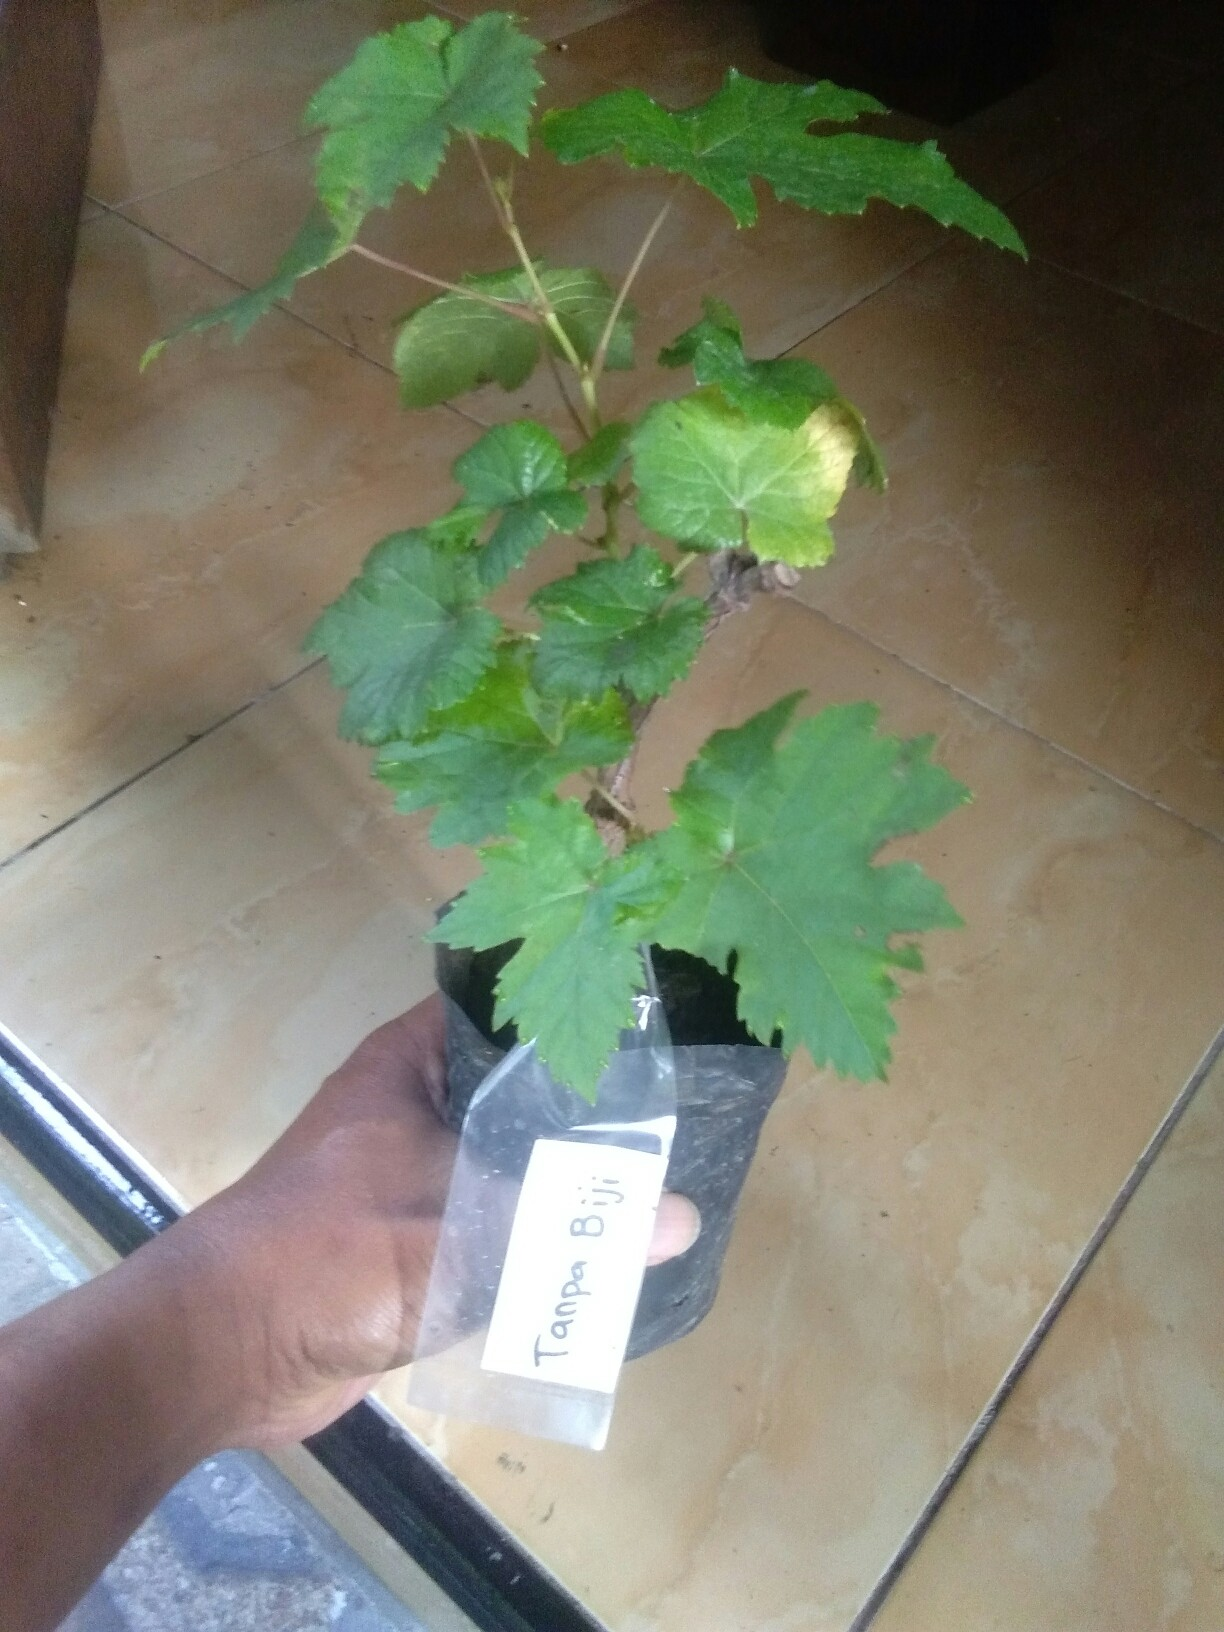 Jual bibit tanaman buah Anggur Tanpa Biji